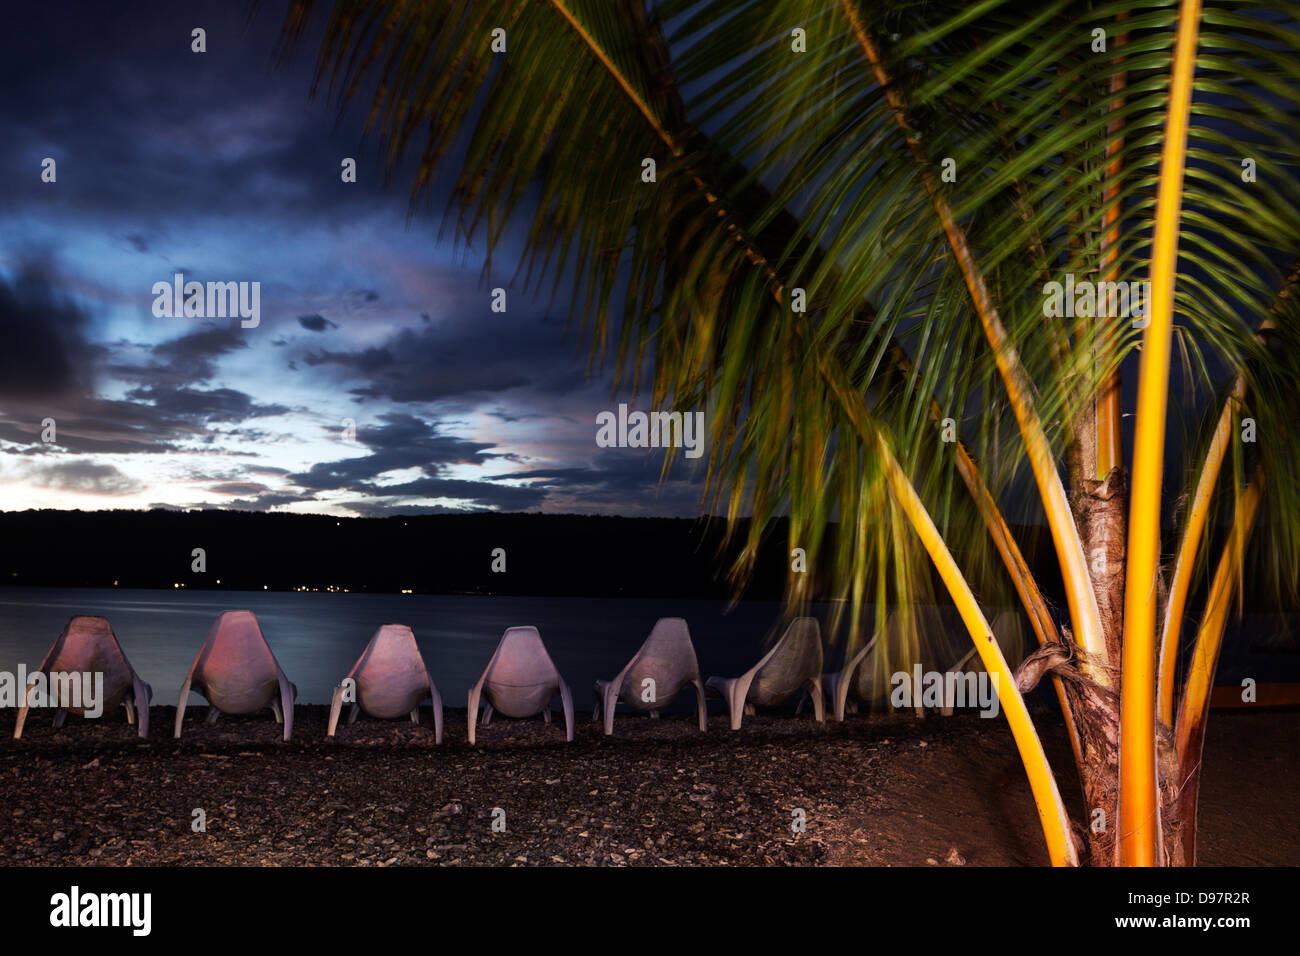 Sunset on Hideway Island, Vanuatu. Efate Island in the background. - Stock Image